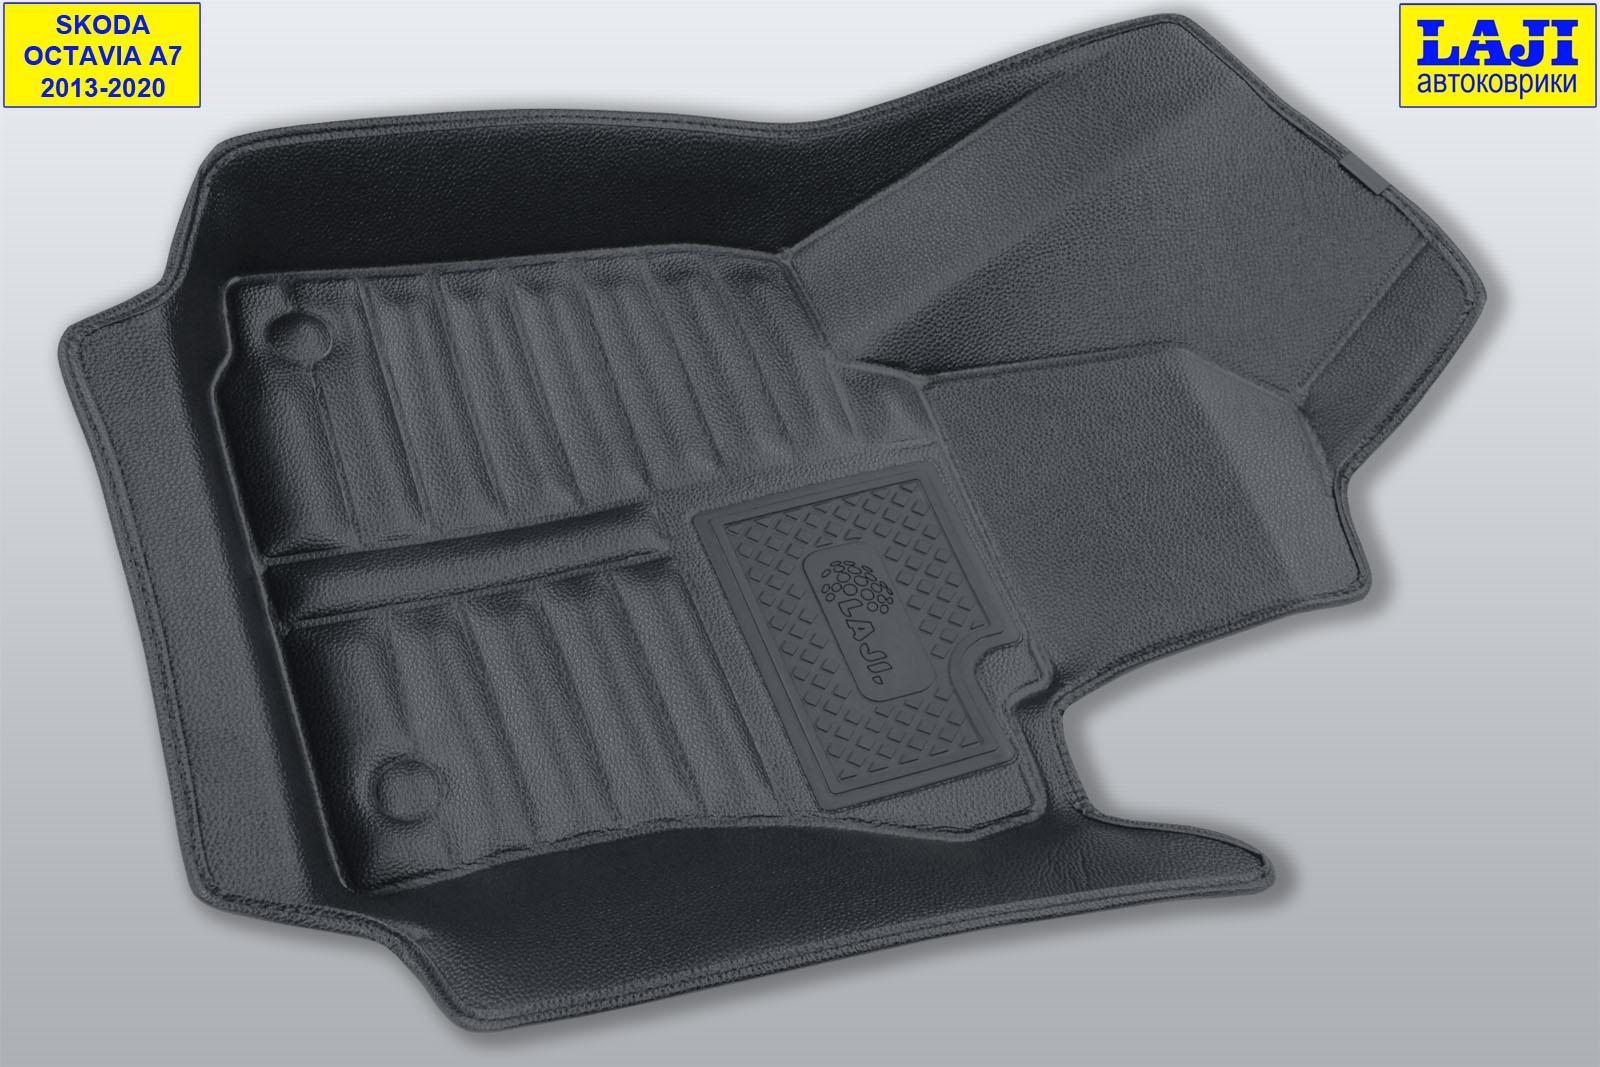 5D коврики в салон Skoda Octavia A7 2013-2020 2